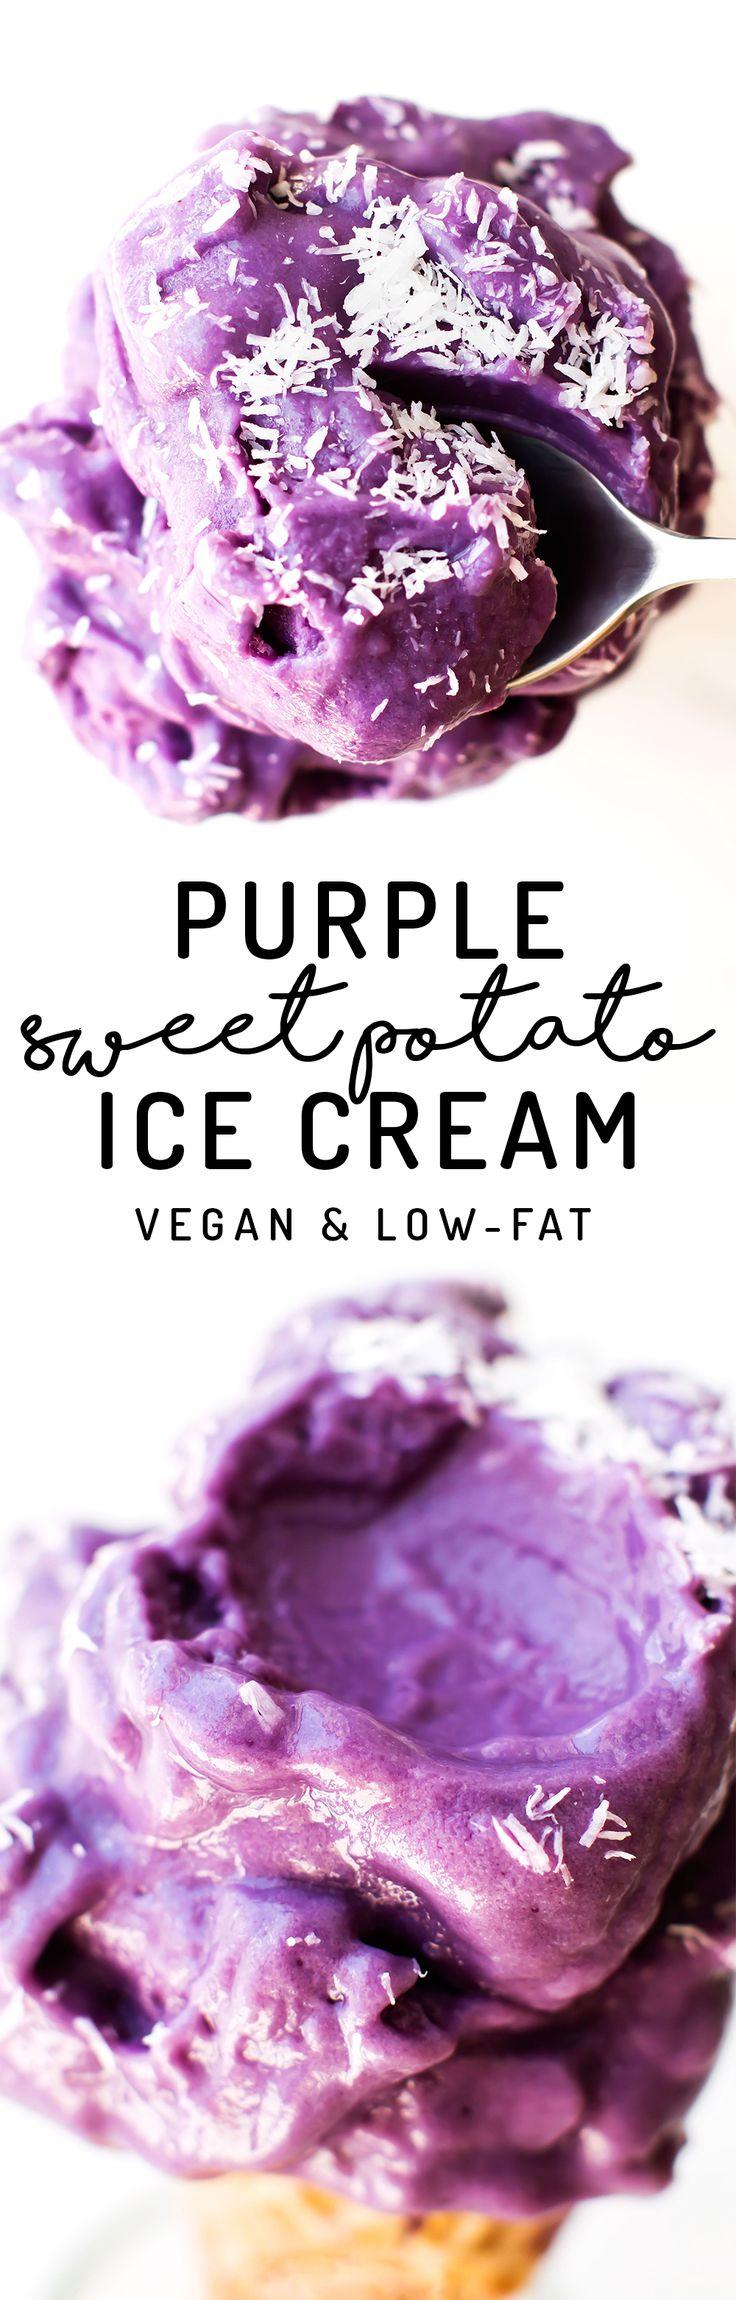 Purple Sweet Potato Ice Cream (vegan, paleo, low-fat)